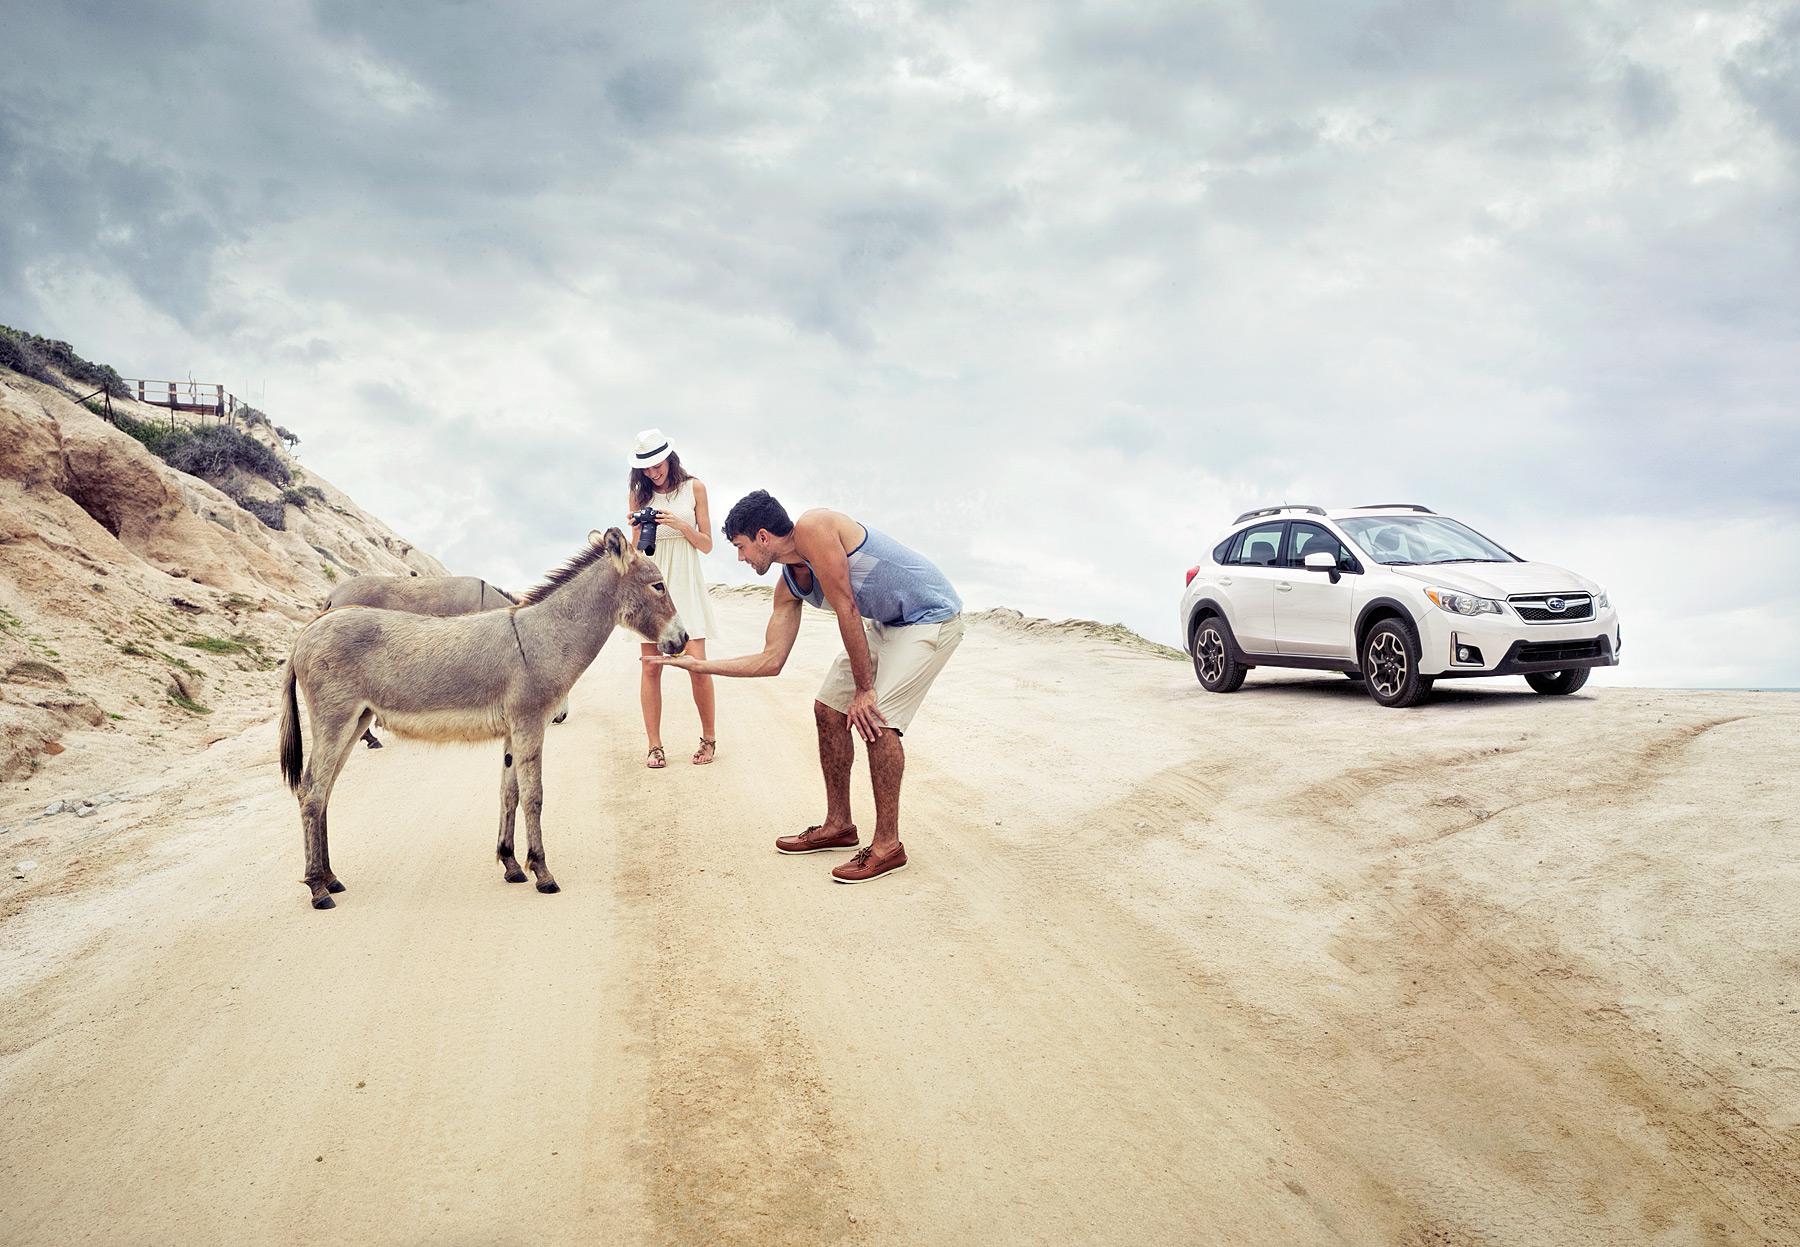 NHP_Subaru_Donkeys_COMP01_FED_Nick_v1.jpg